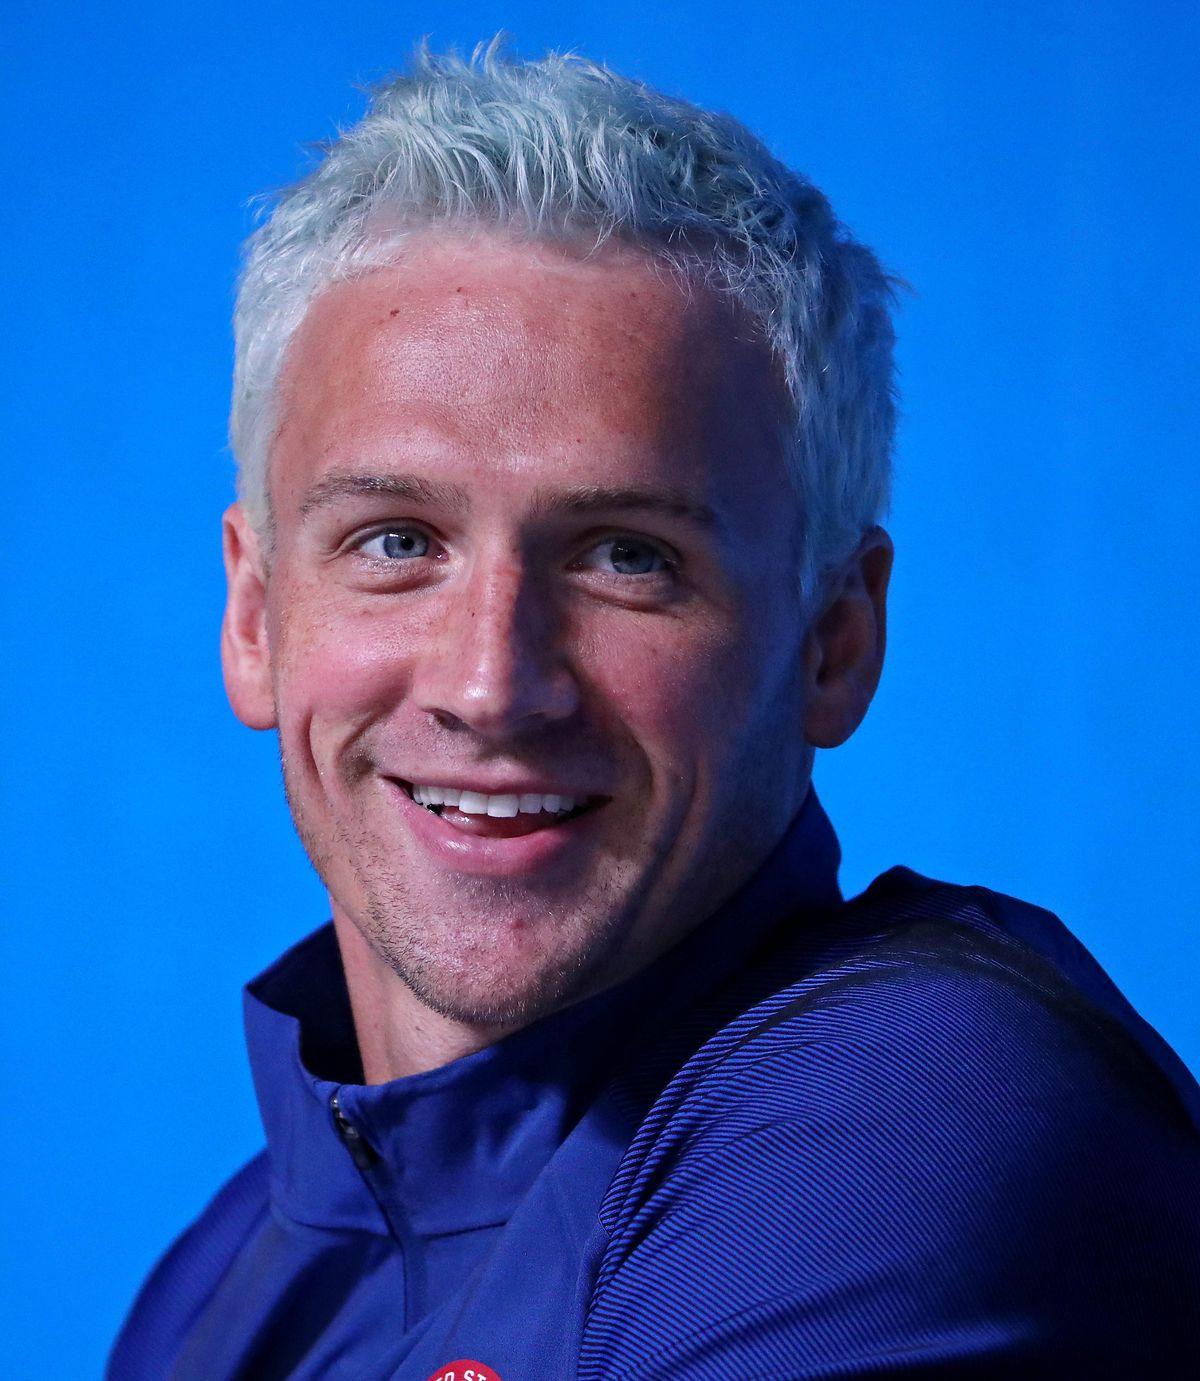 Olympics: USA Swimming Press Conference